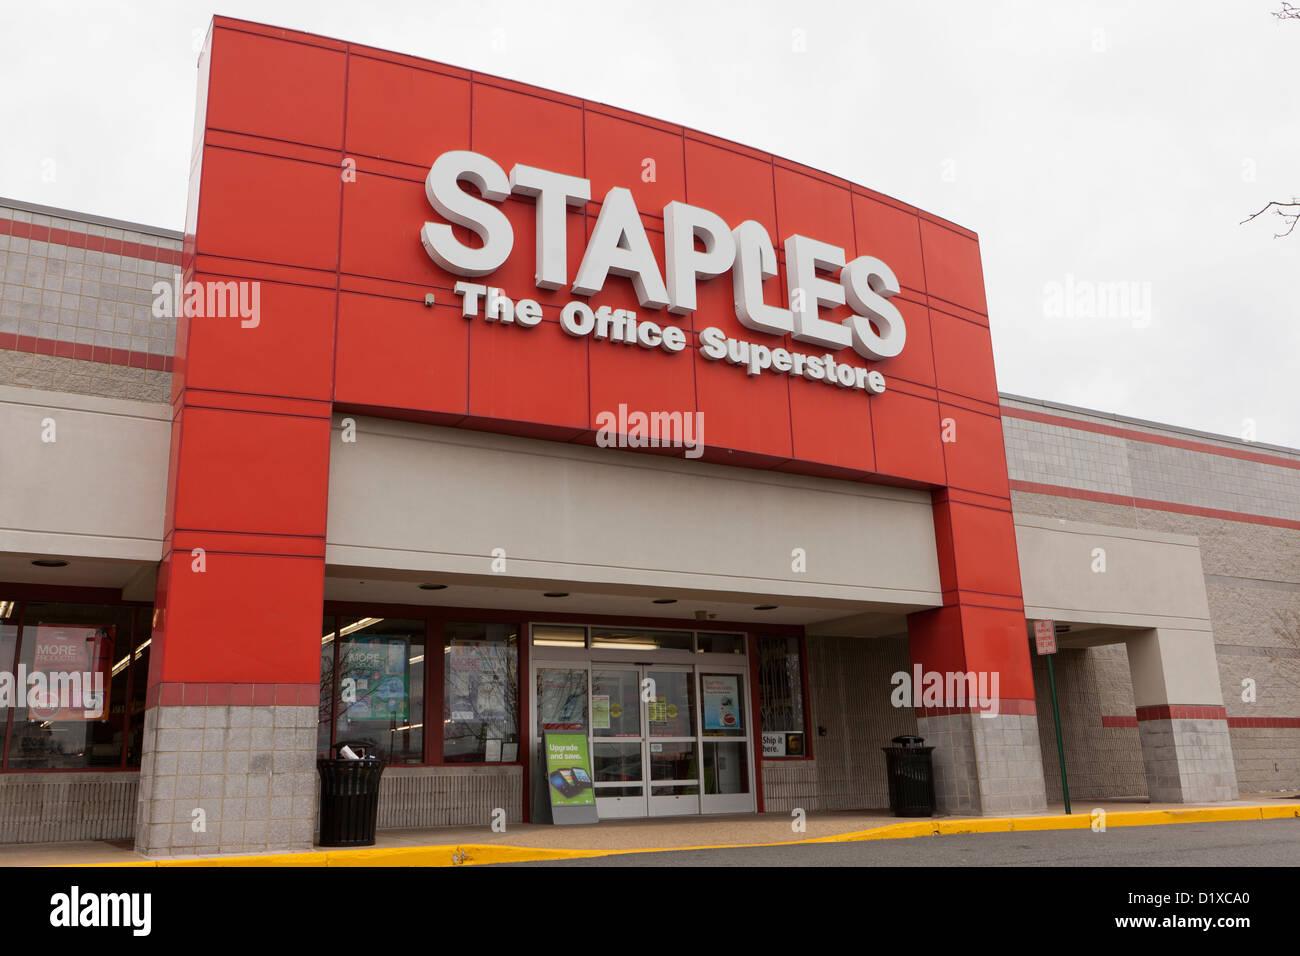 Staples retail store - Stock Image